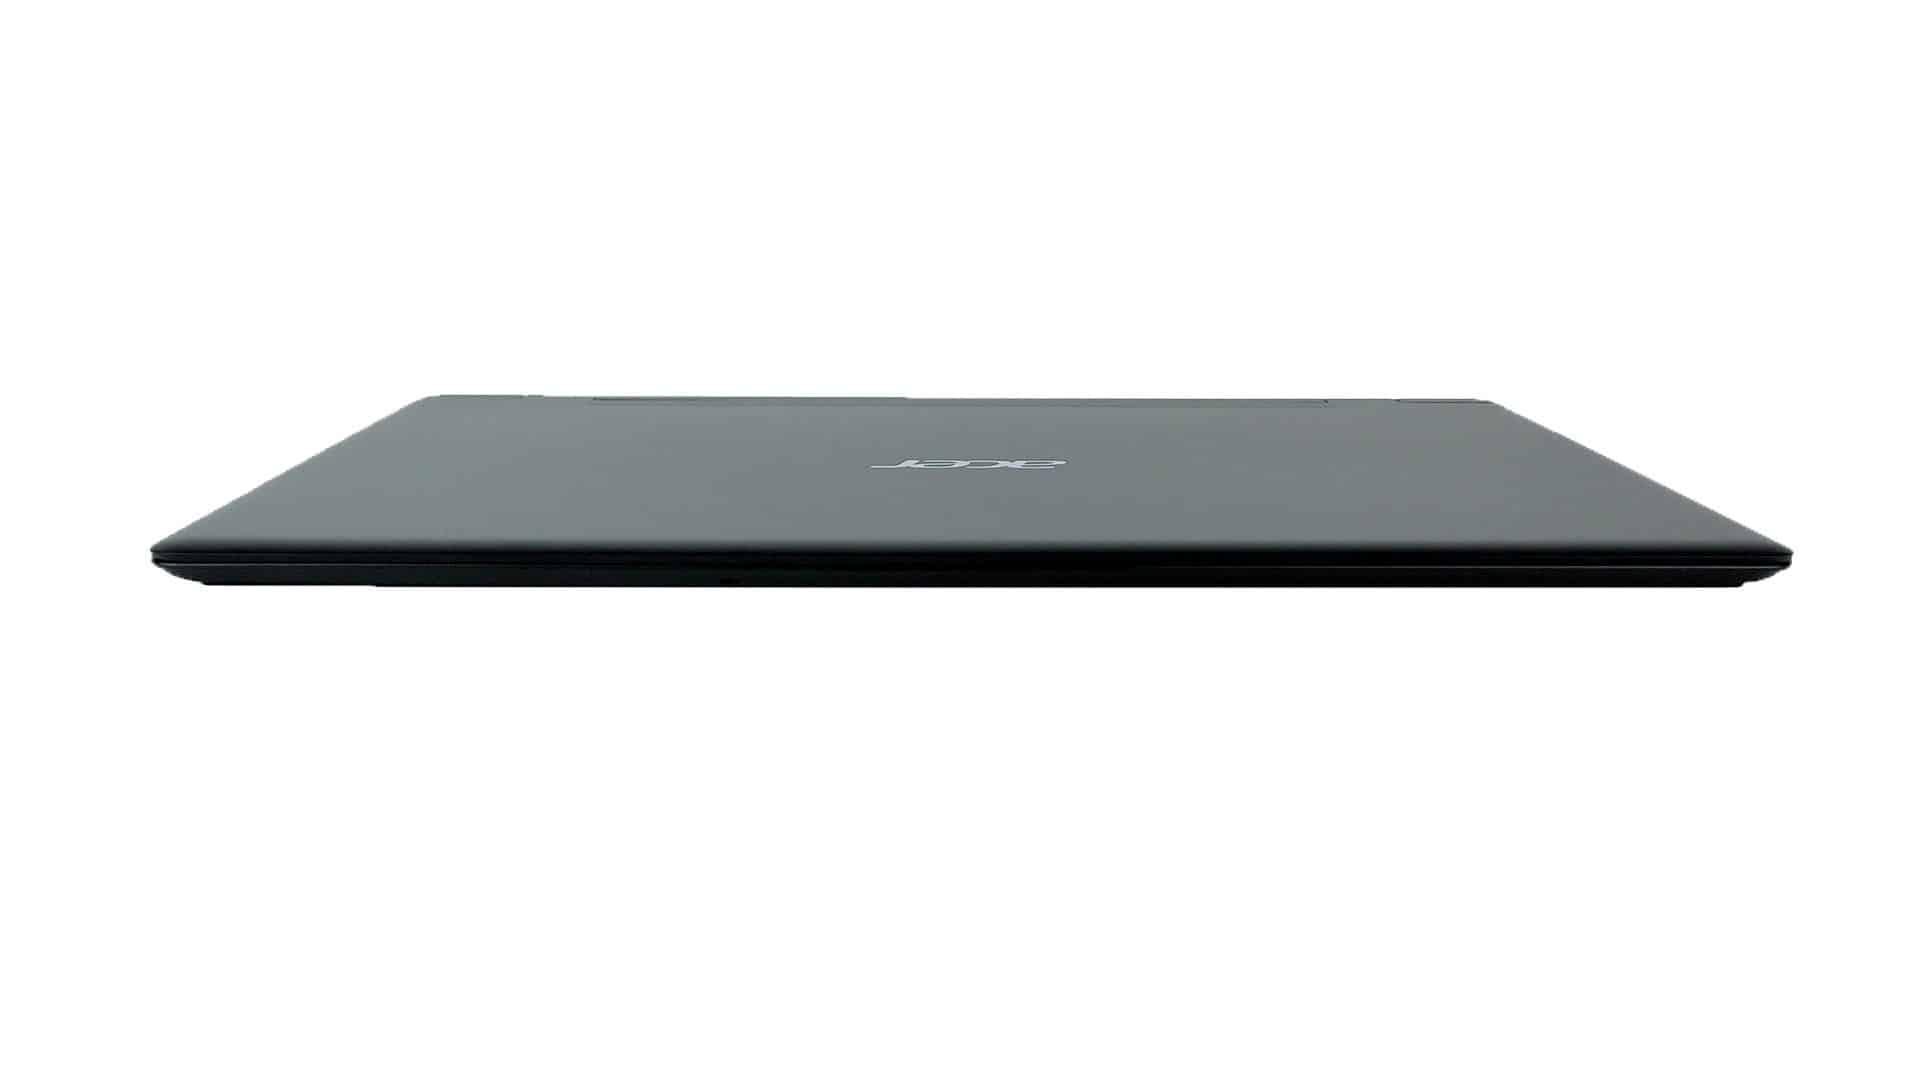 Acer Swift 7 2018 - przód notebooka